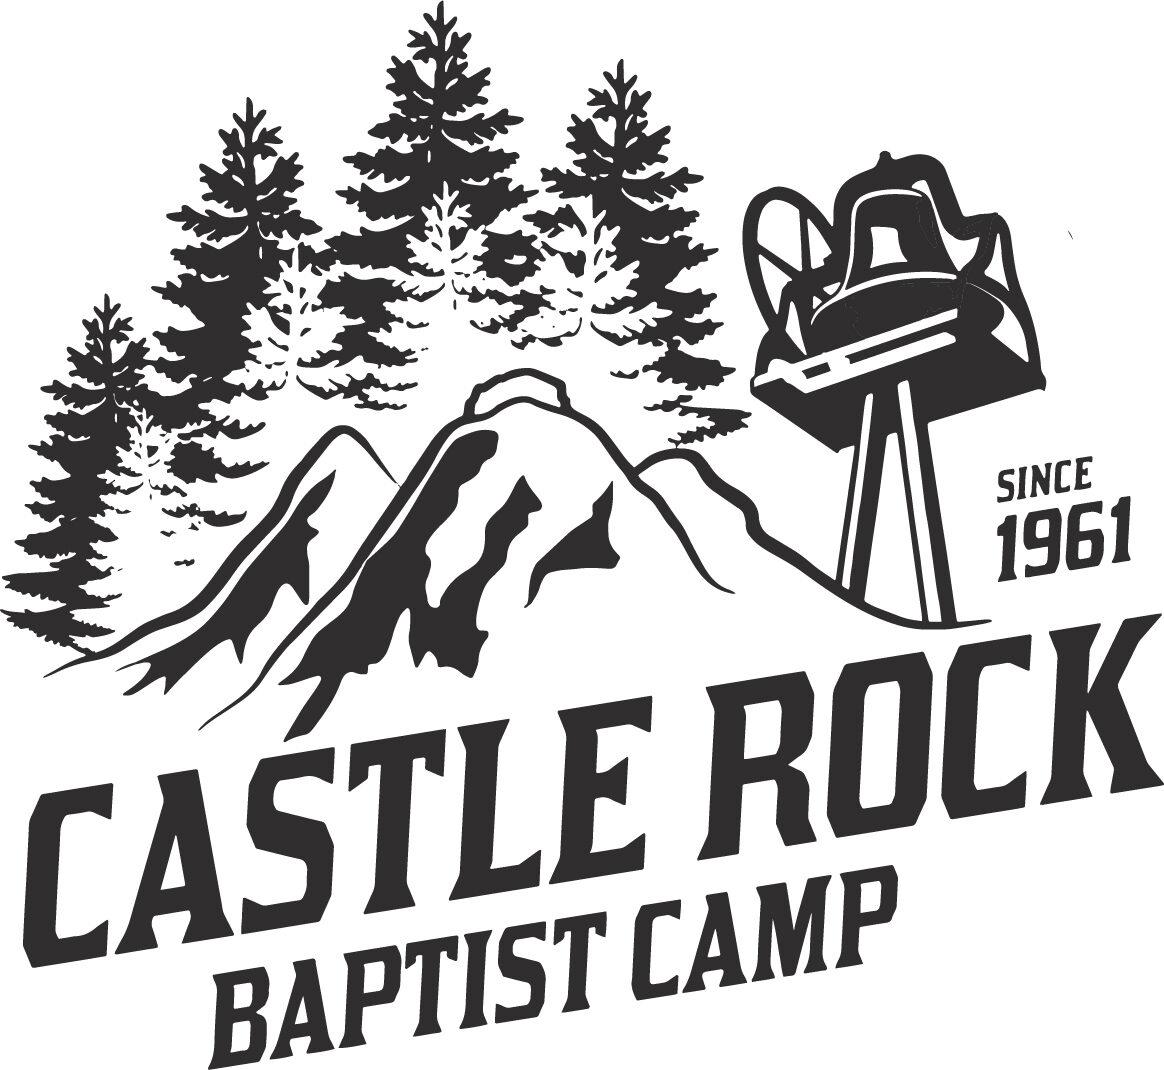 Castle Rock Baptist Camp